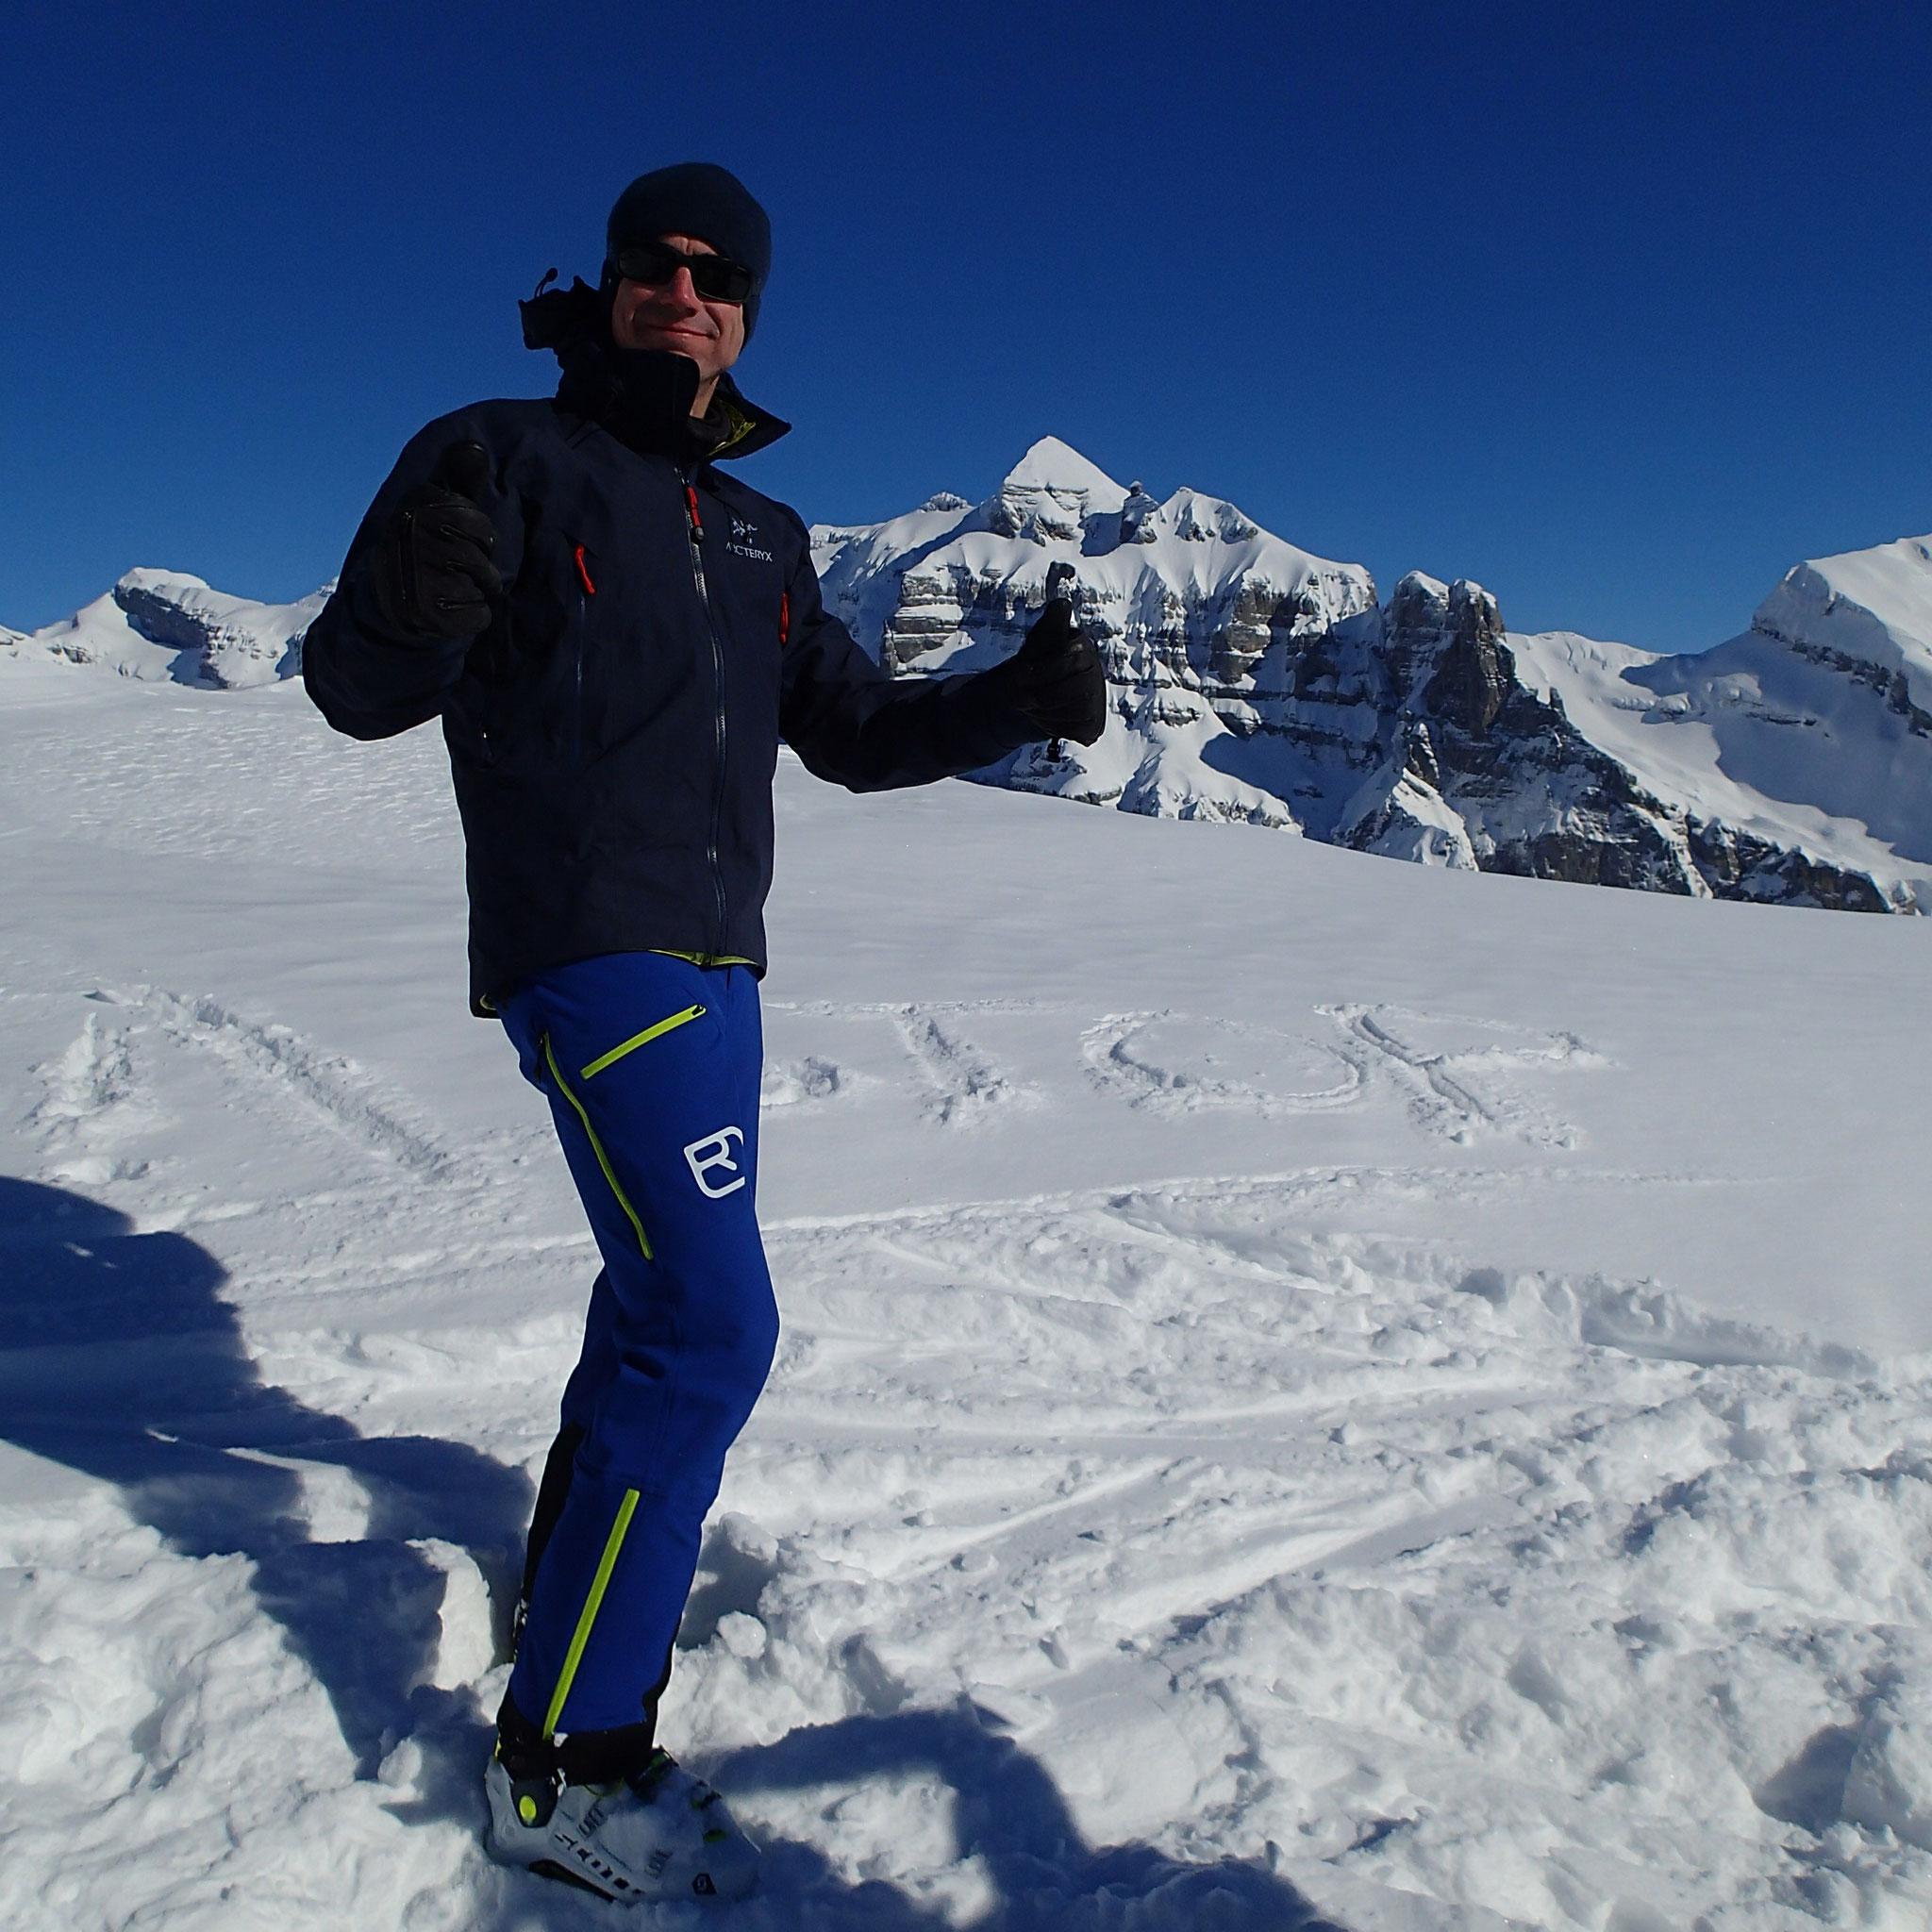 Bravo Fabrice ! Summit !